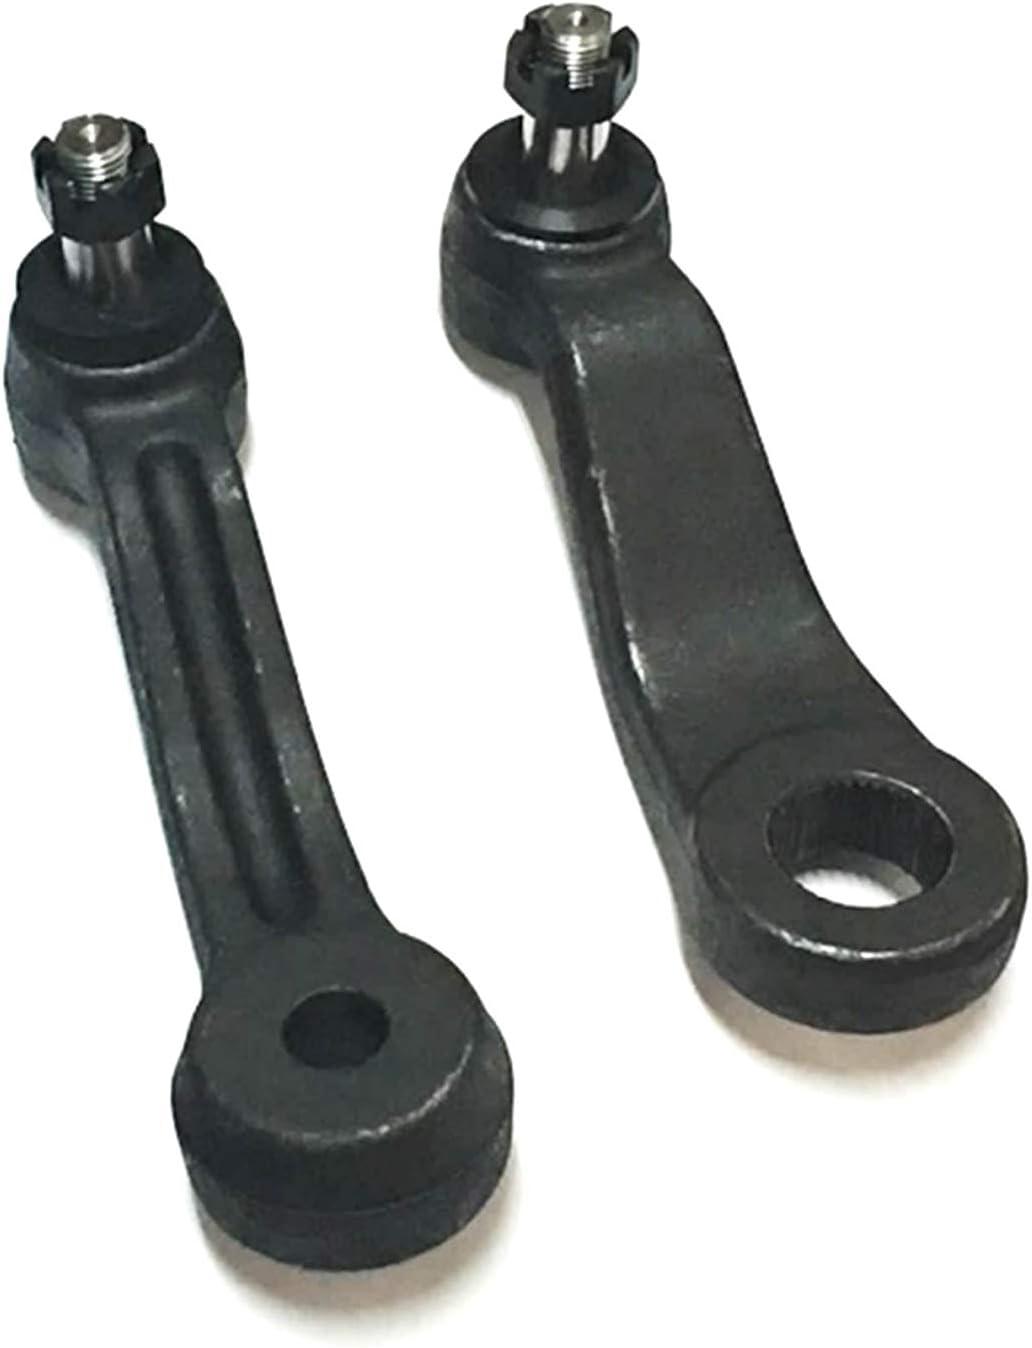 Steering Idler /& Pitman Arms Kit New 2 Pc